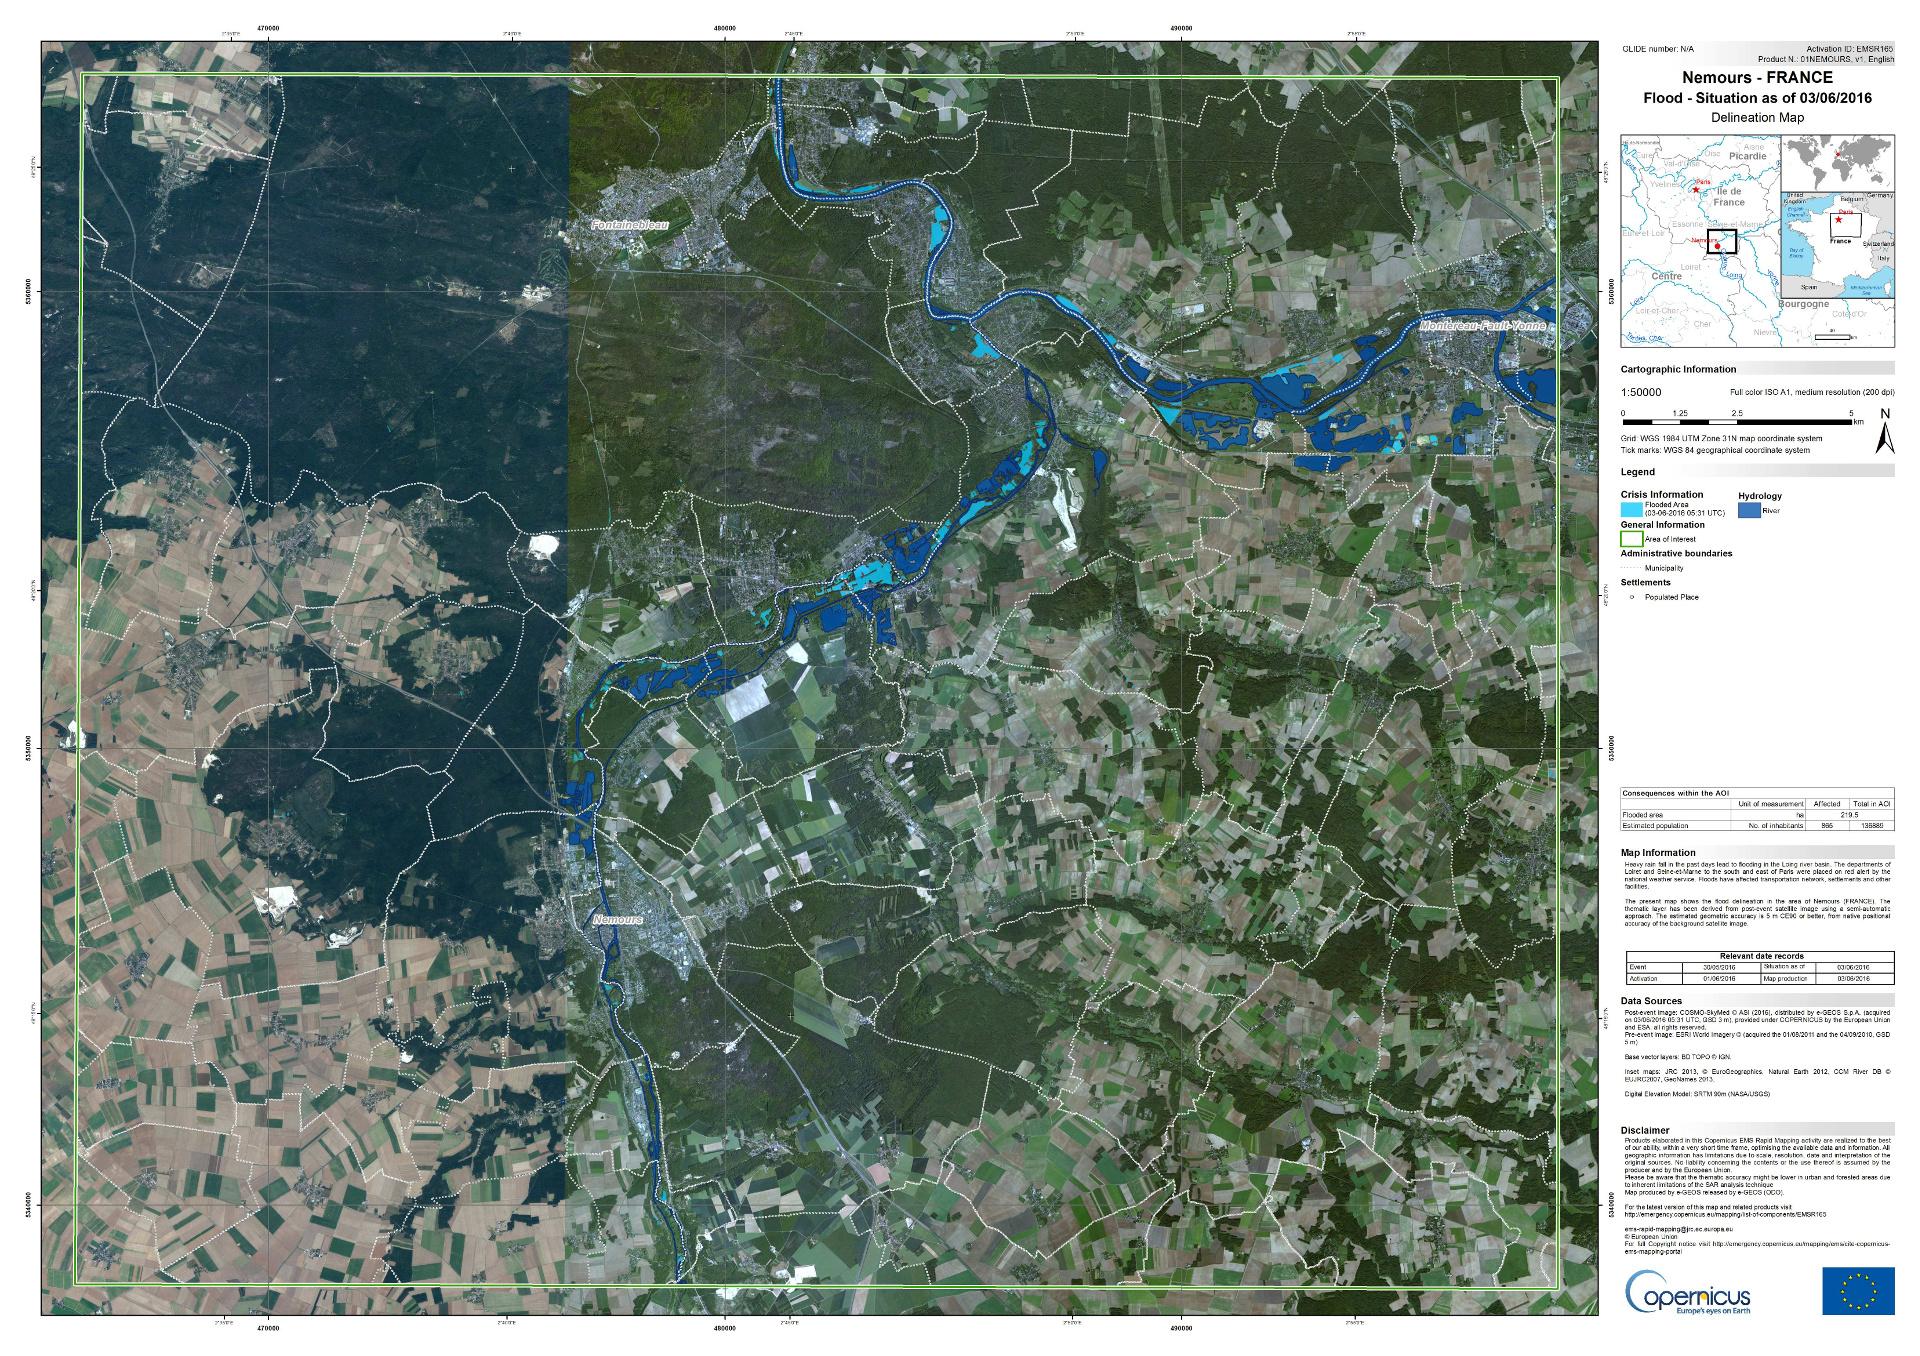 Nemours - Inondations - Juin 2016 - Copernicus Emergency Mapping - Cosmo-Skymed - radar - carte de situation - Commission européenne